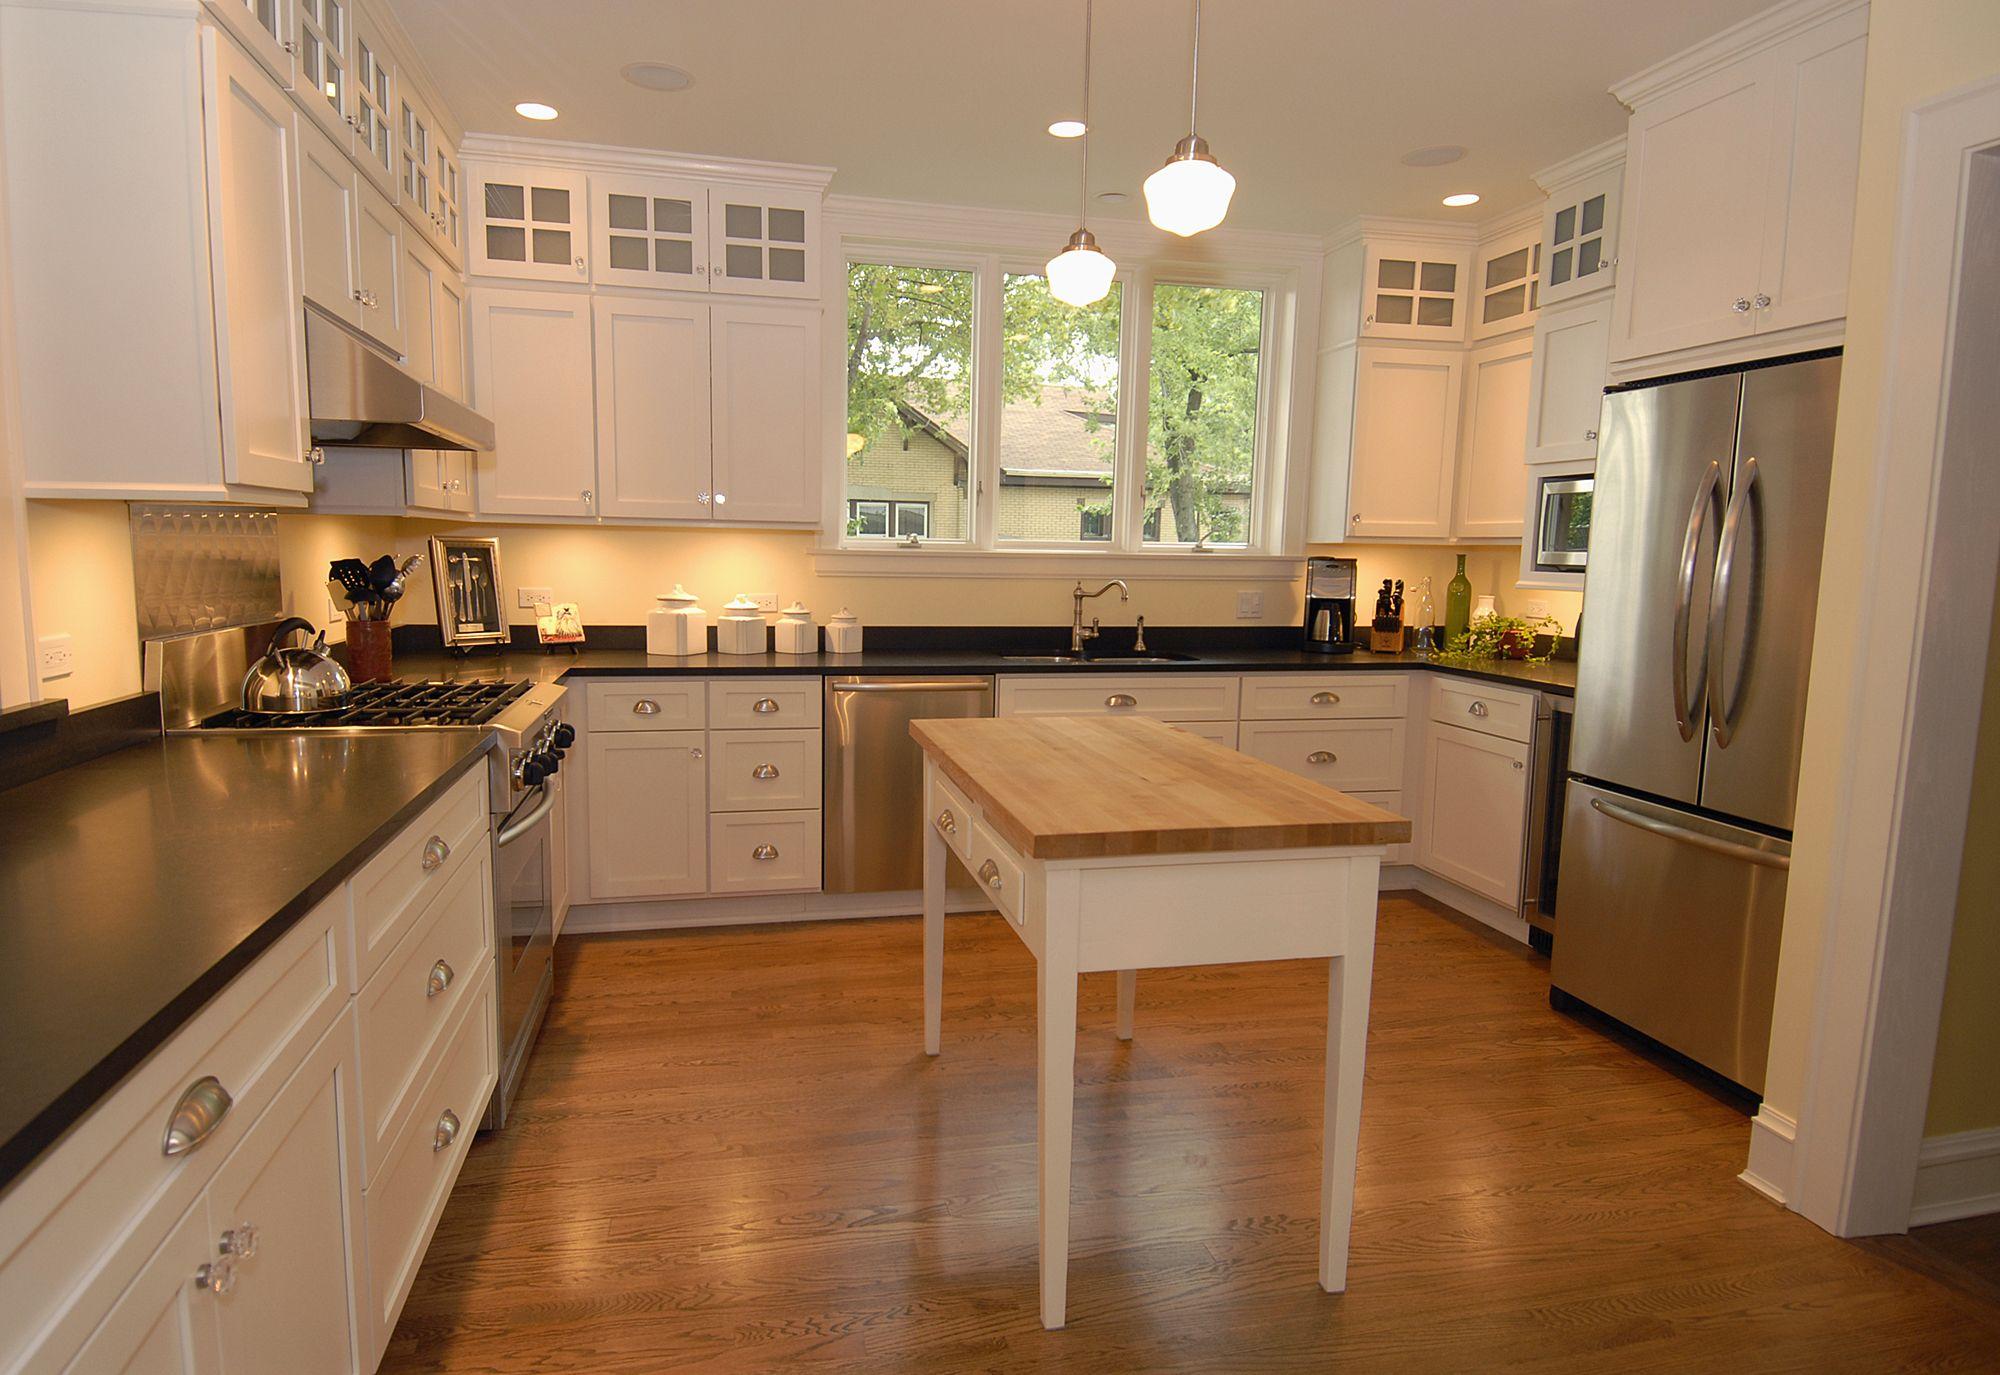 Bungalow U/C-shaped kitchen example | Architecture ...